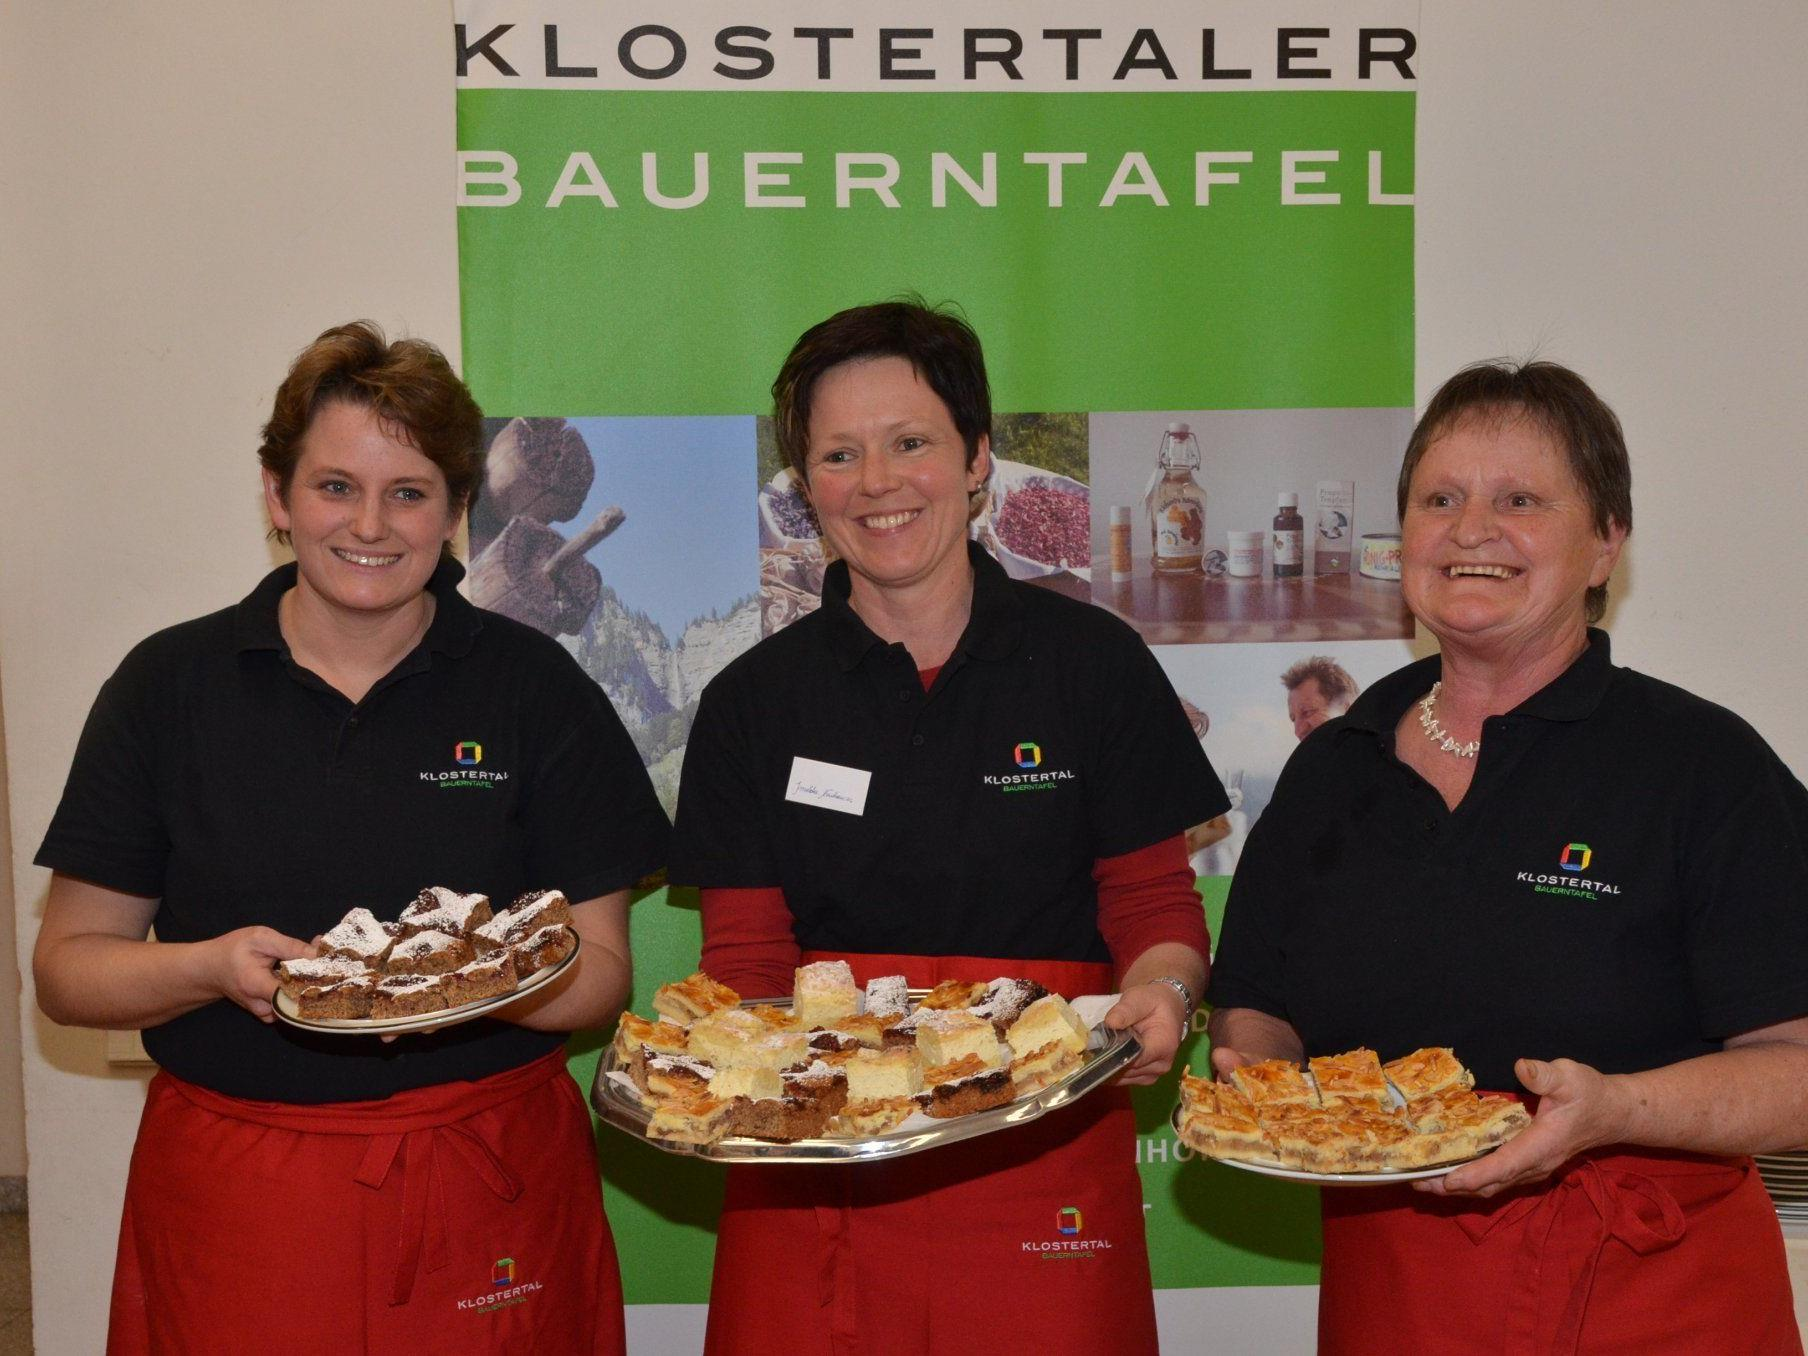 Klostertaler Bauerntafel